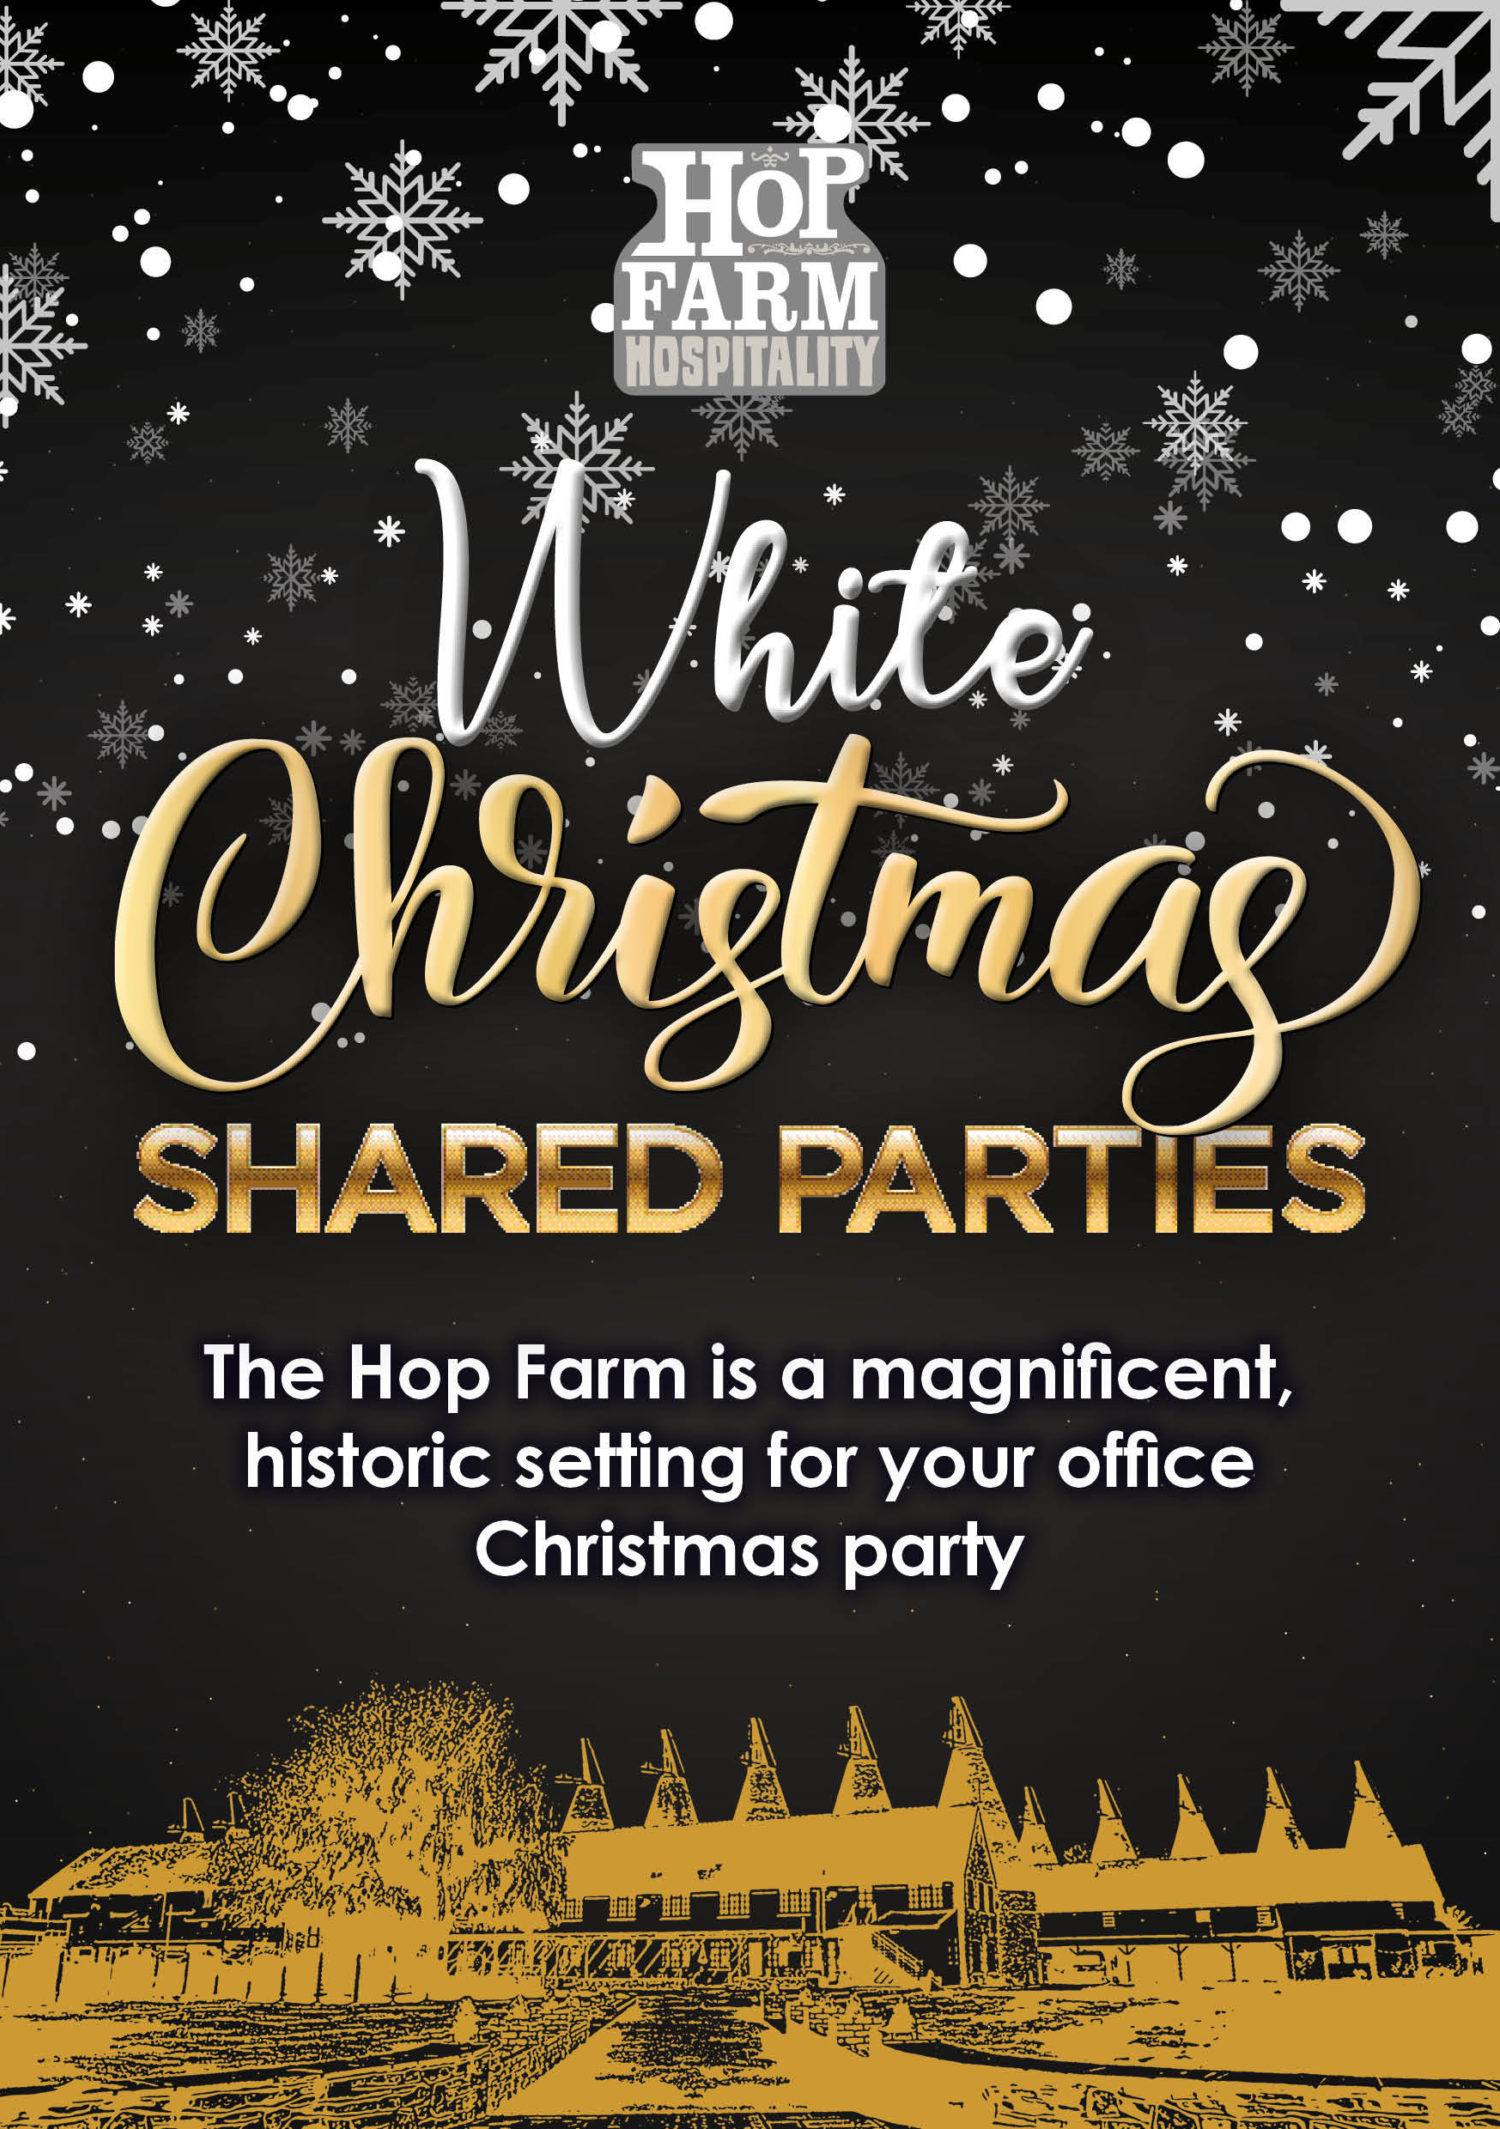 Christmas Party 2019 Logo.Christmas Parties The Hop Farm